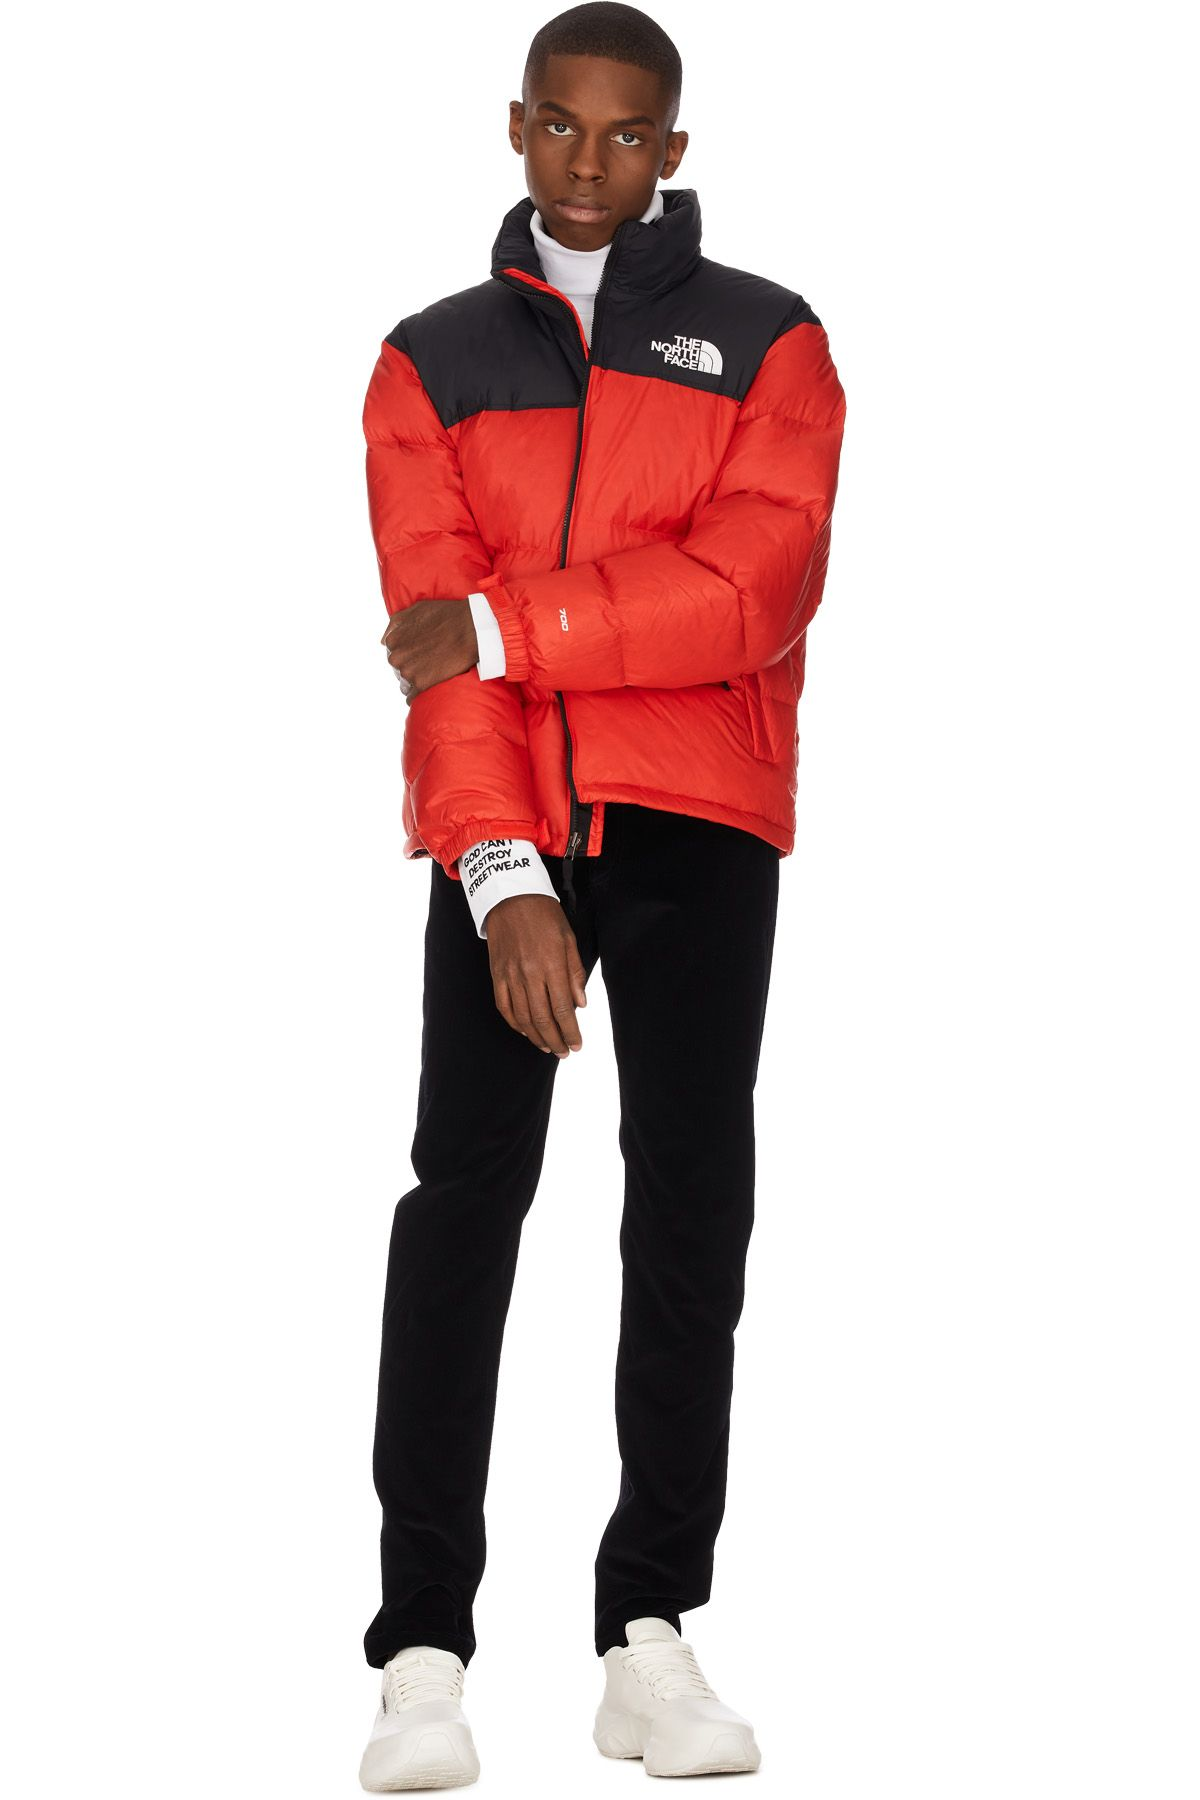 The North Face 1996 Retro Nuptse Jacket Fiery Red 1996 Retro Nuptse Jacket Retro Nuptse Jacket Jackets [ 1800 x 1200 Pixel ]